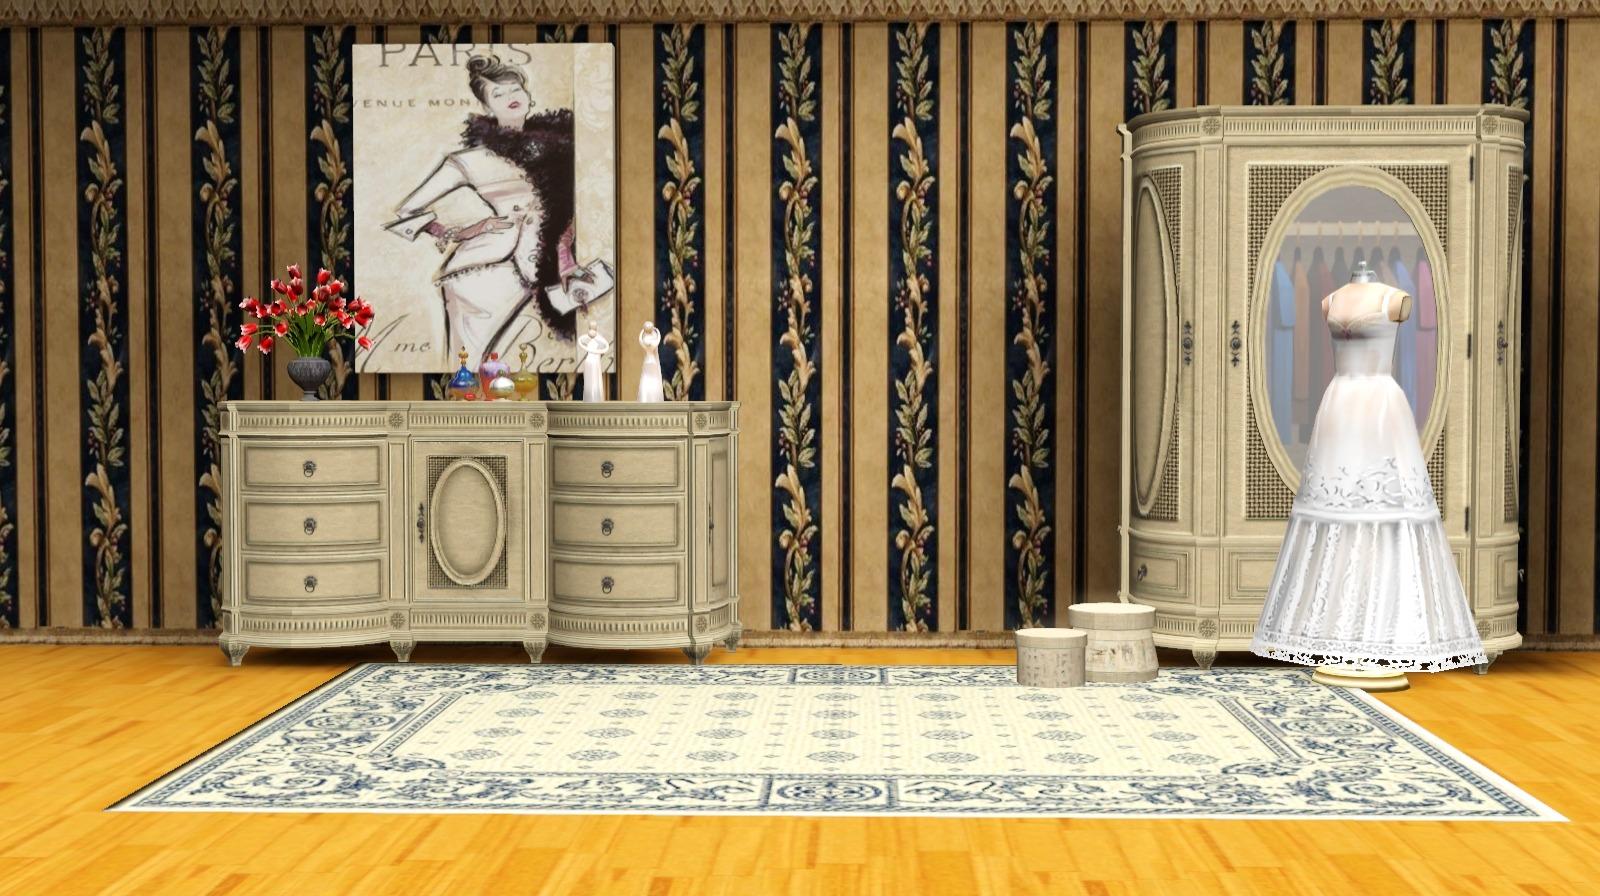 Victorian Walls by Ladesire. Текстуры взяты из The Sims 2/ Textures were taken from The Sims2 & Ladesire\u0027s creative corner): Victorian Walls by Ladesire